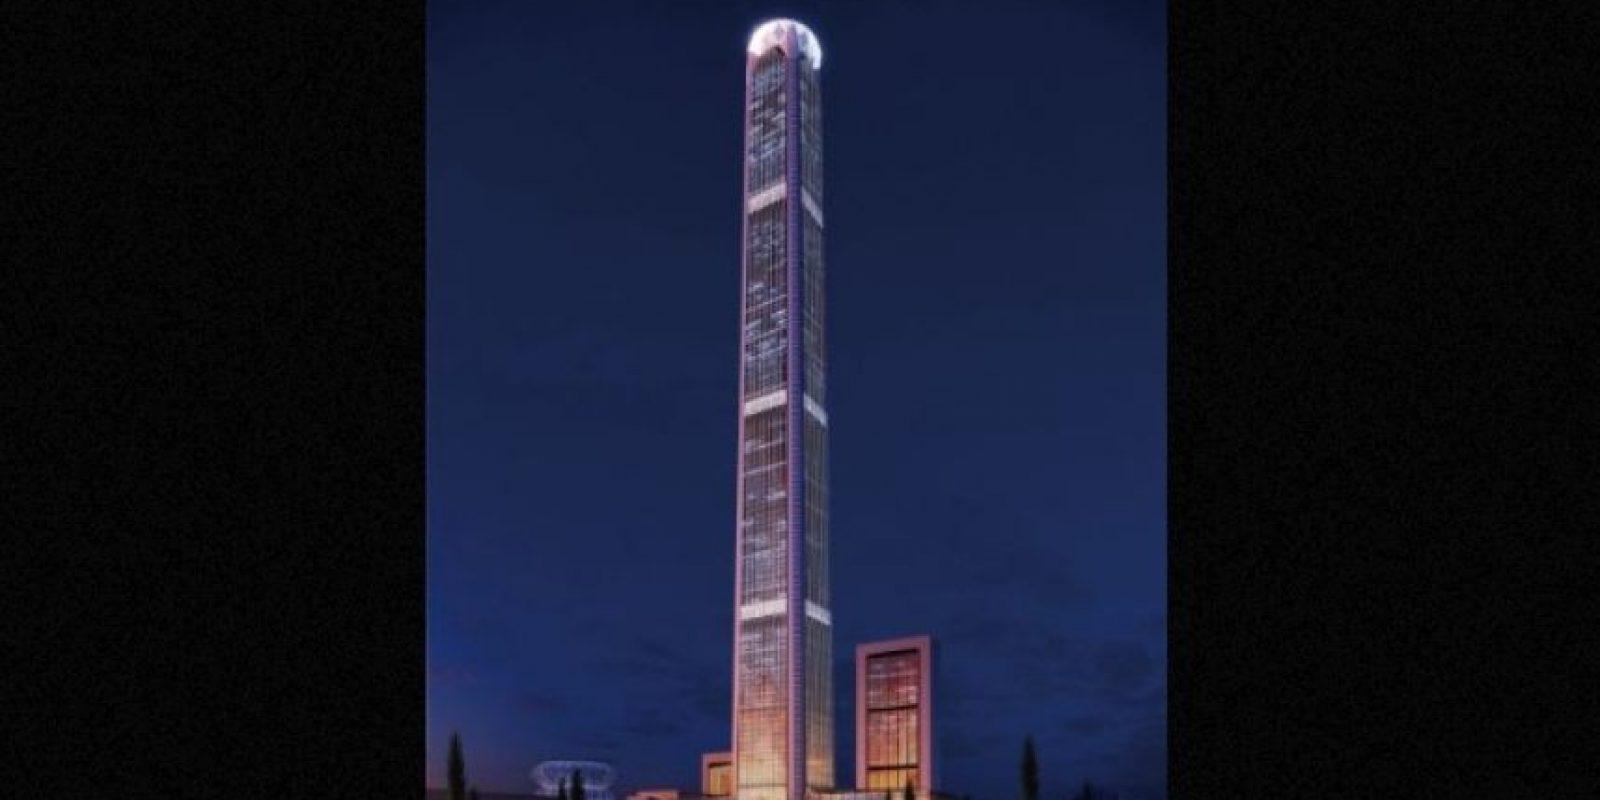 5. Goldin Finance 117 (China) – 128 pisos – 596 metros (1957 pies) Foto:Skyscrapercity.com